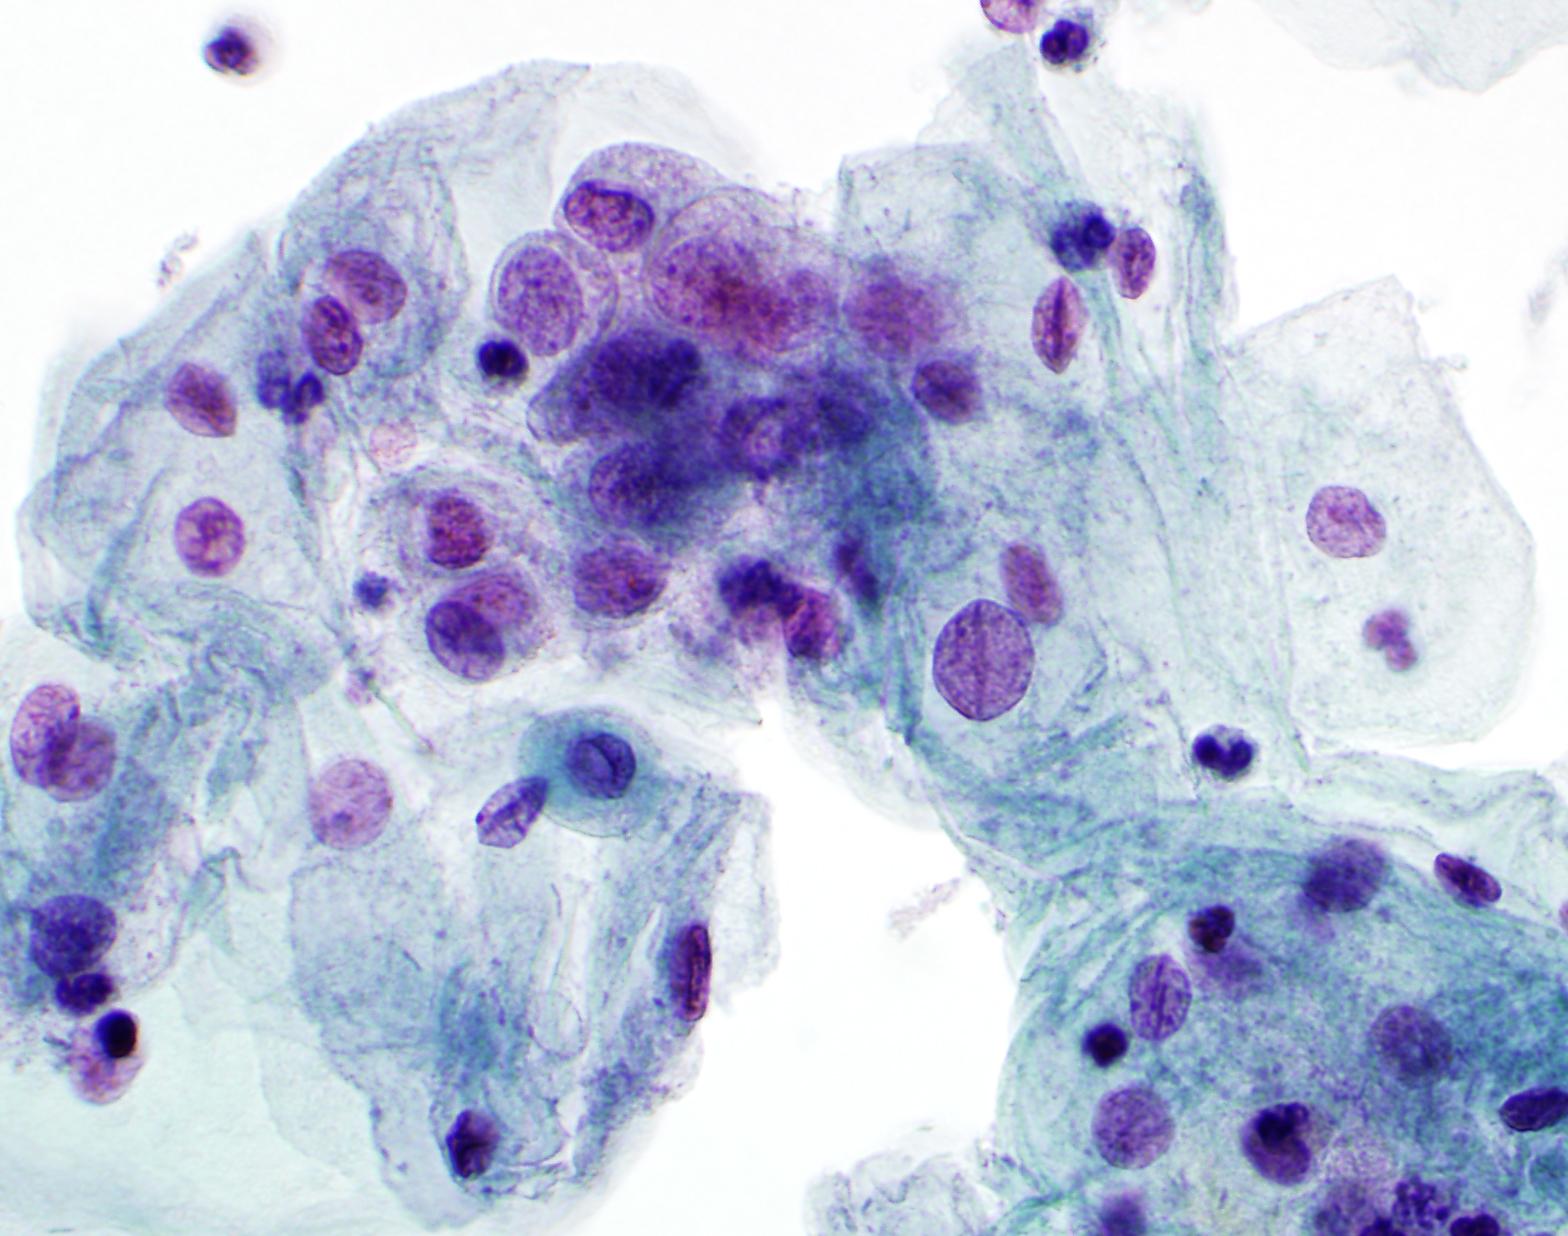 Not favorite abnormal glandular pap smear in vagina